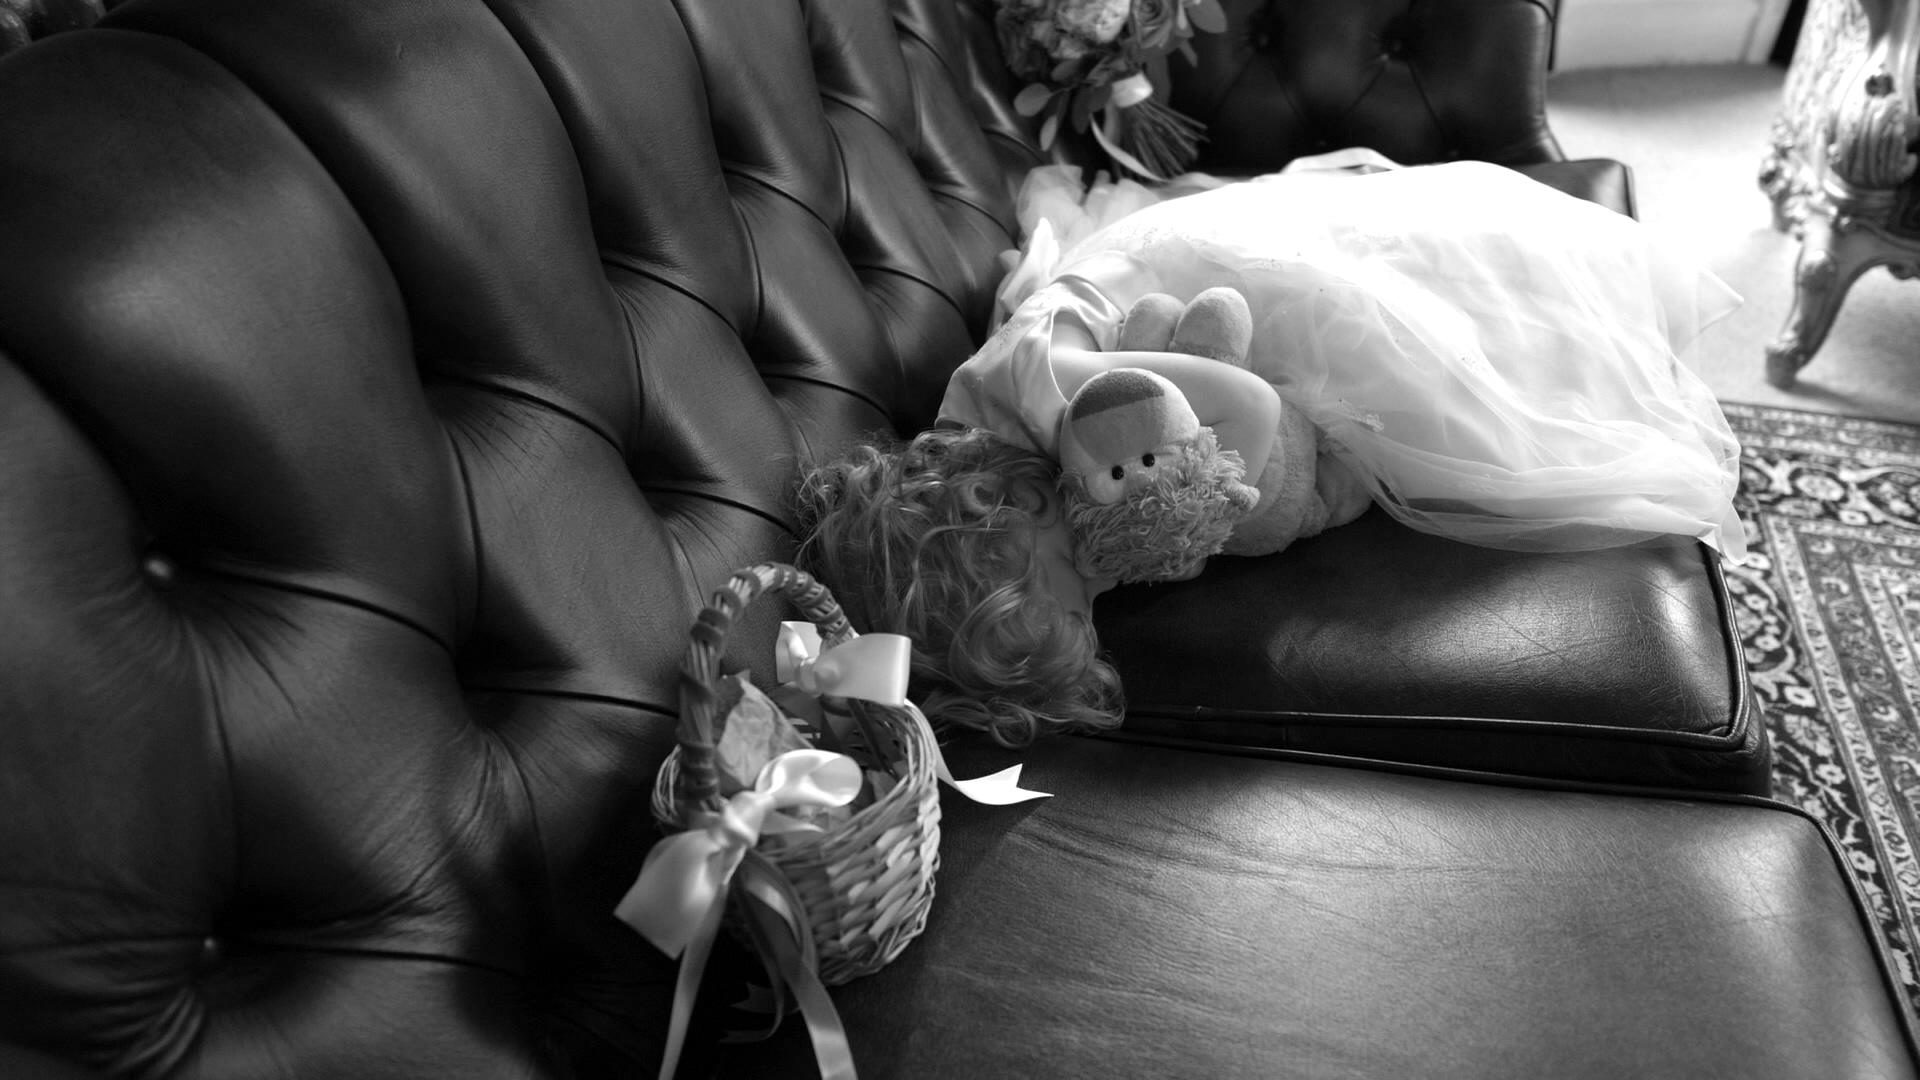 DRUMTOCHTY-SUMMER-WEDDING (20).jpg